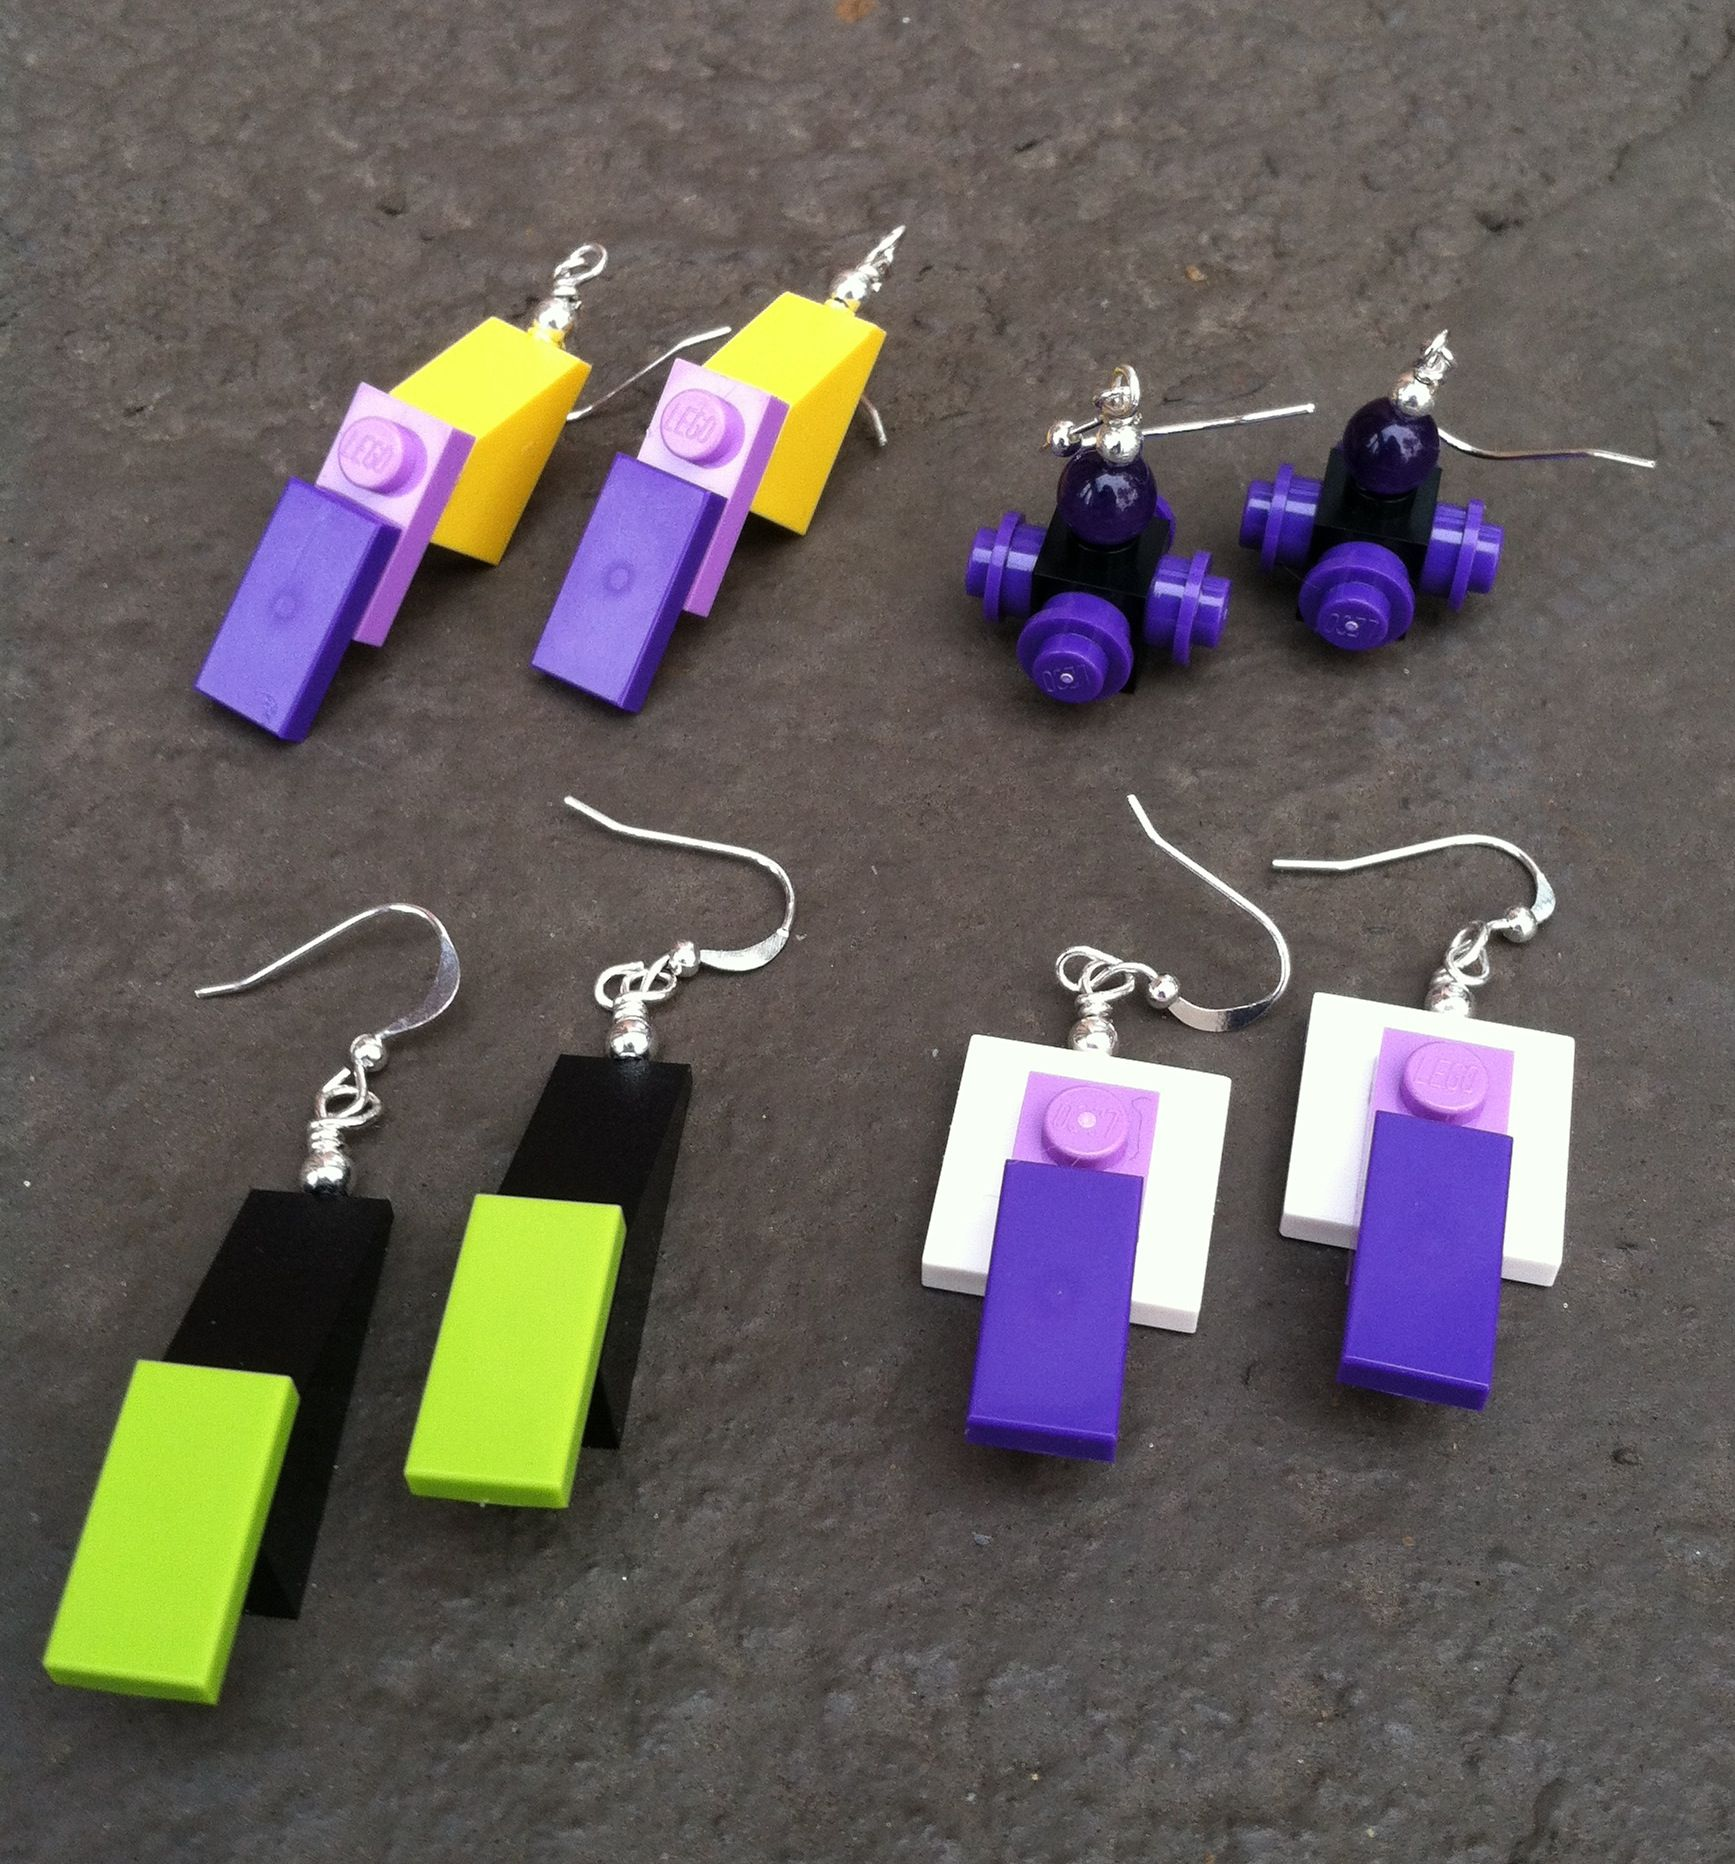 Lego Earrings #handmade #diy #lego #earrings #accessories